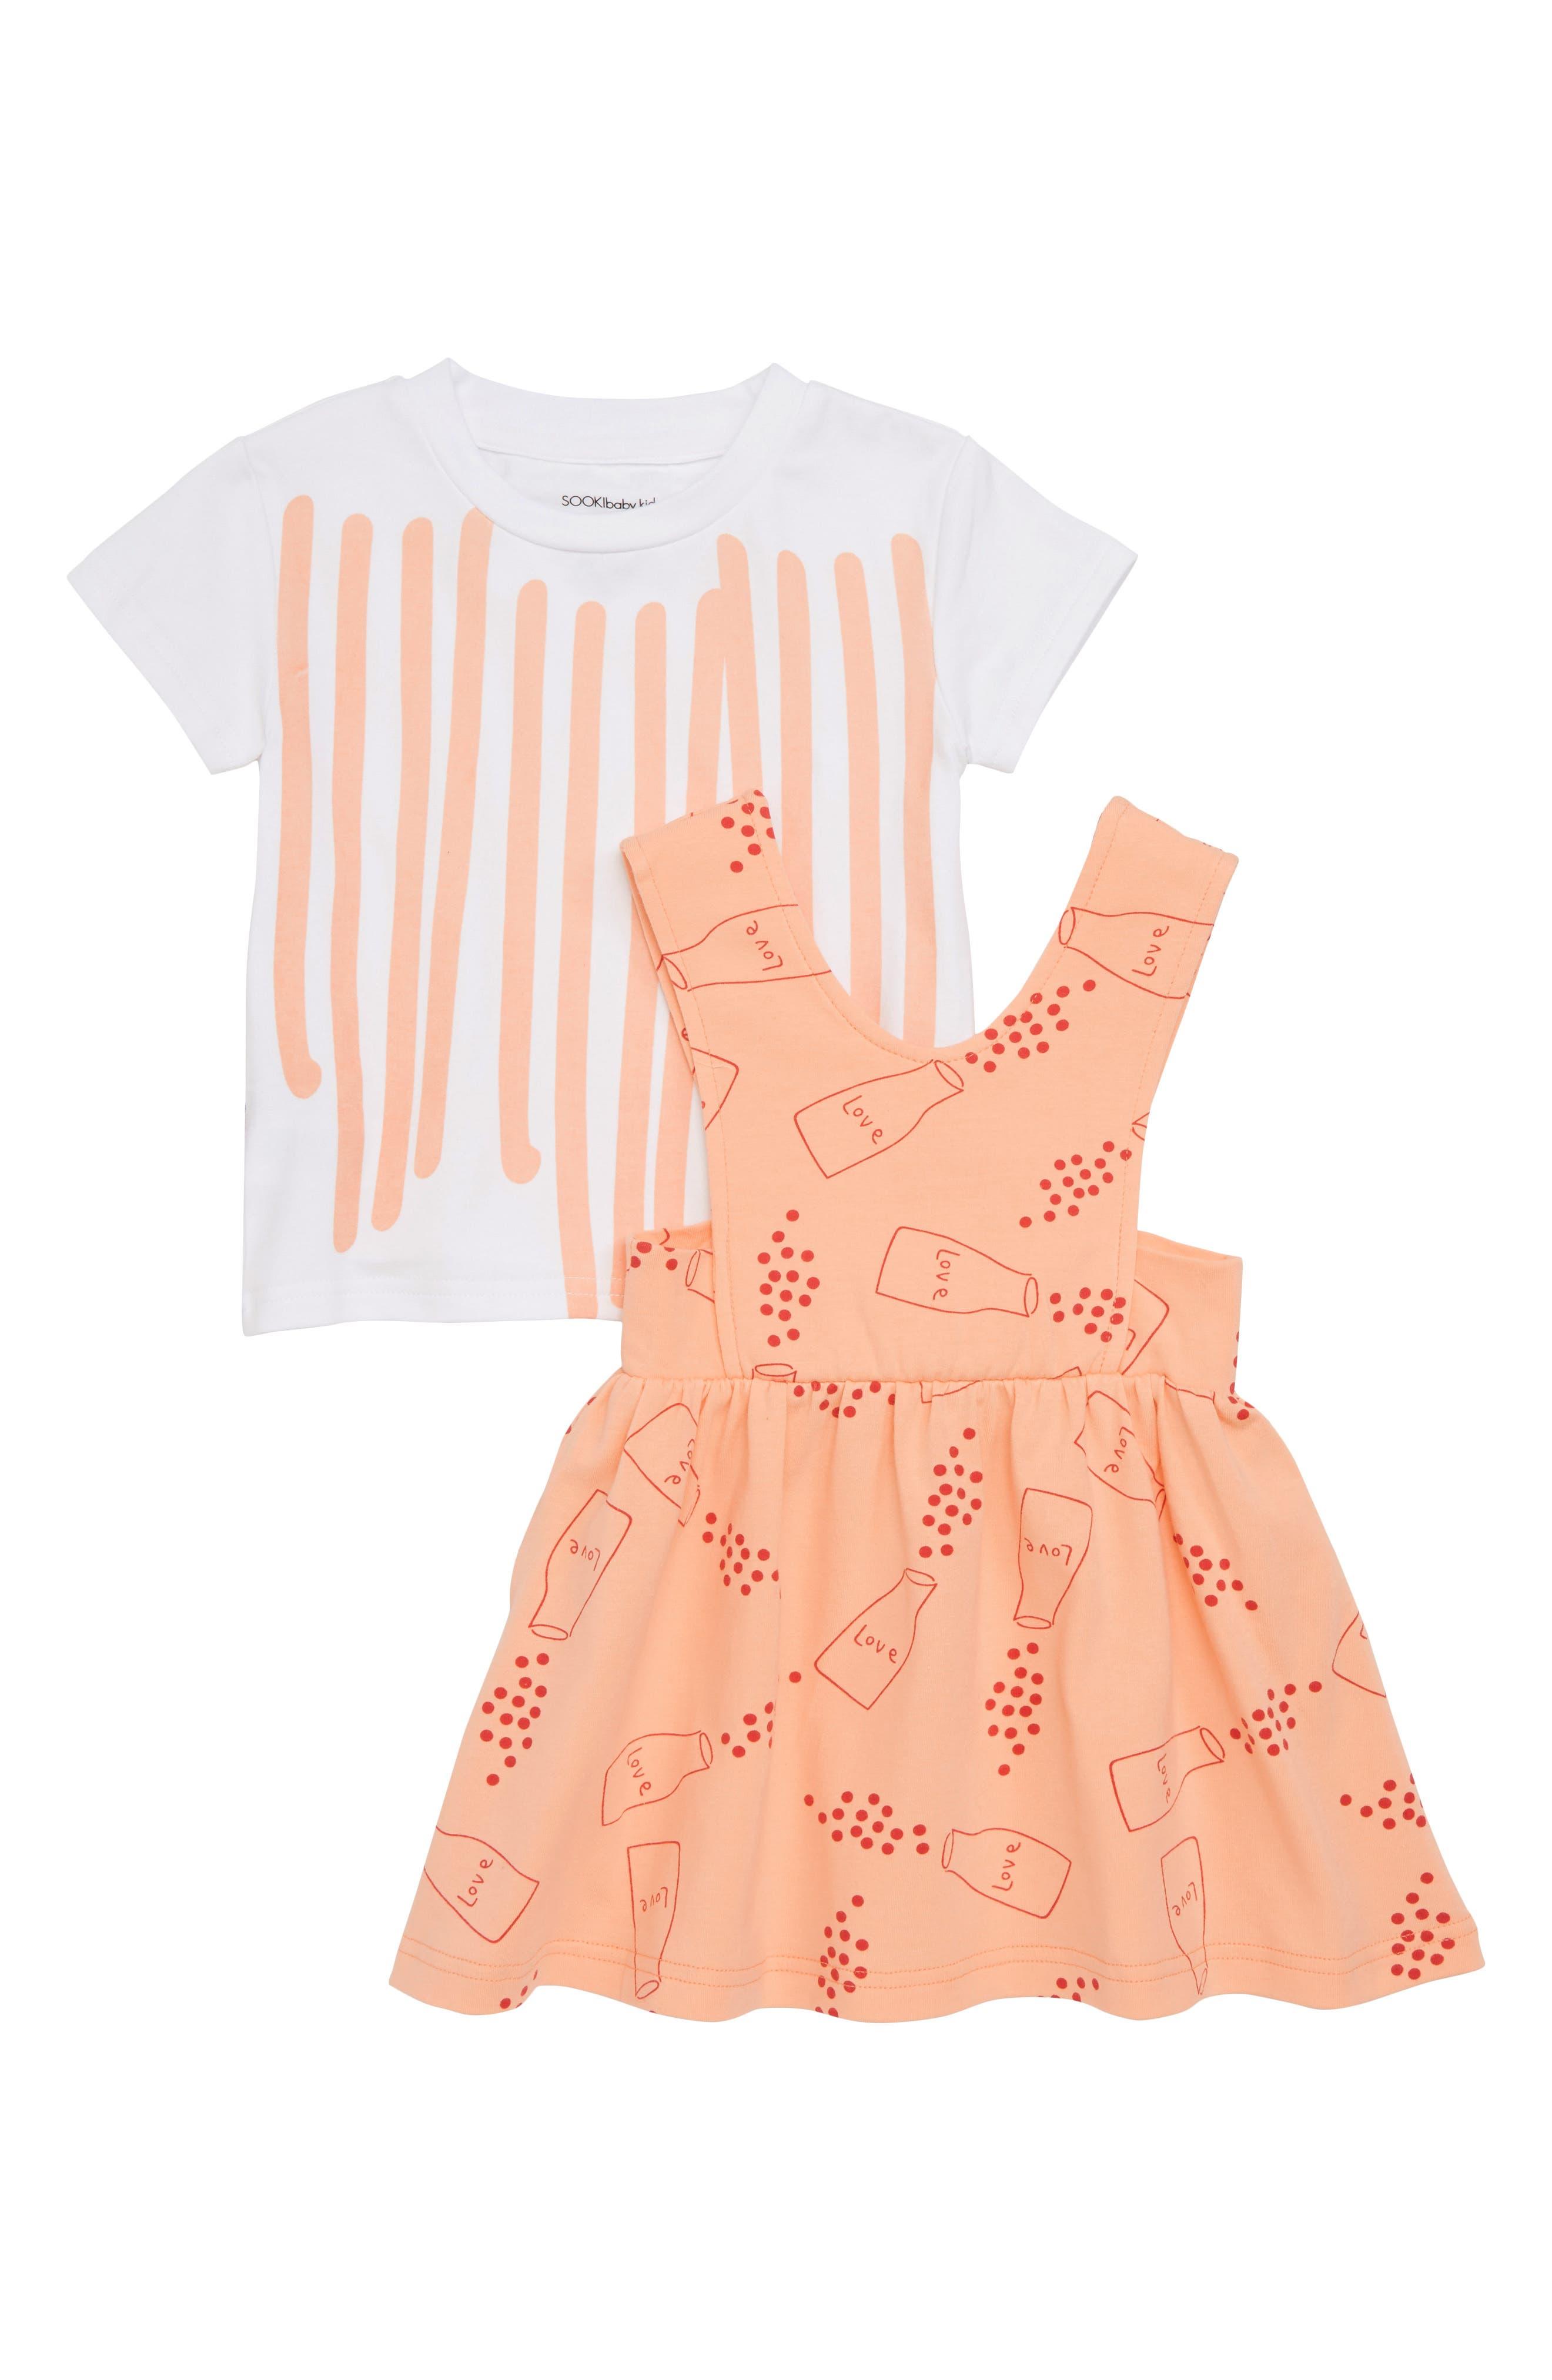 Stripe Tee & Sprinkle Love Pinafore Dress Set,                             Main thumbnail 1, color,                             White / Peach